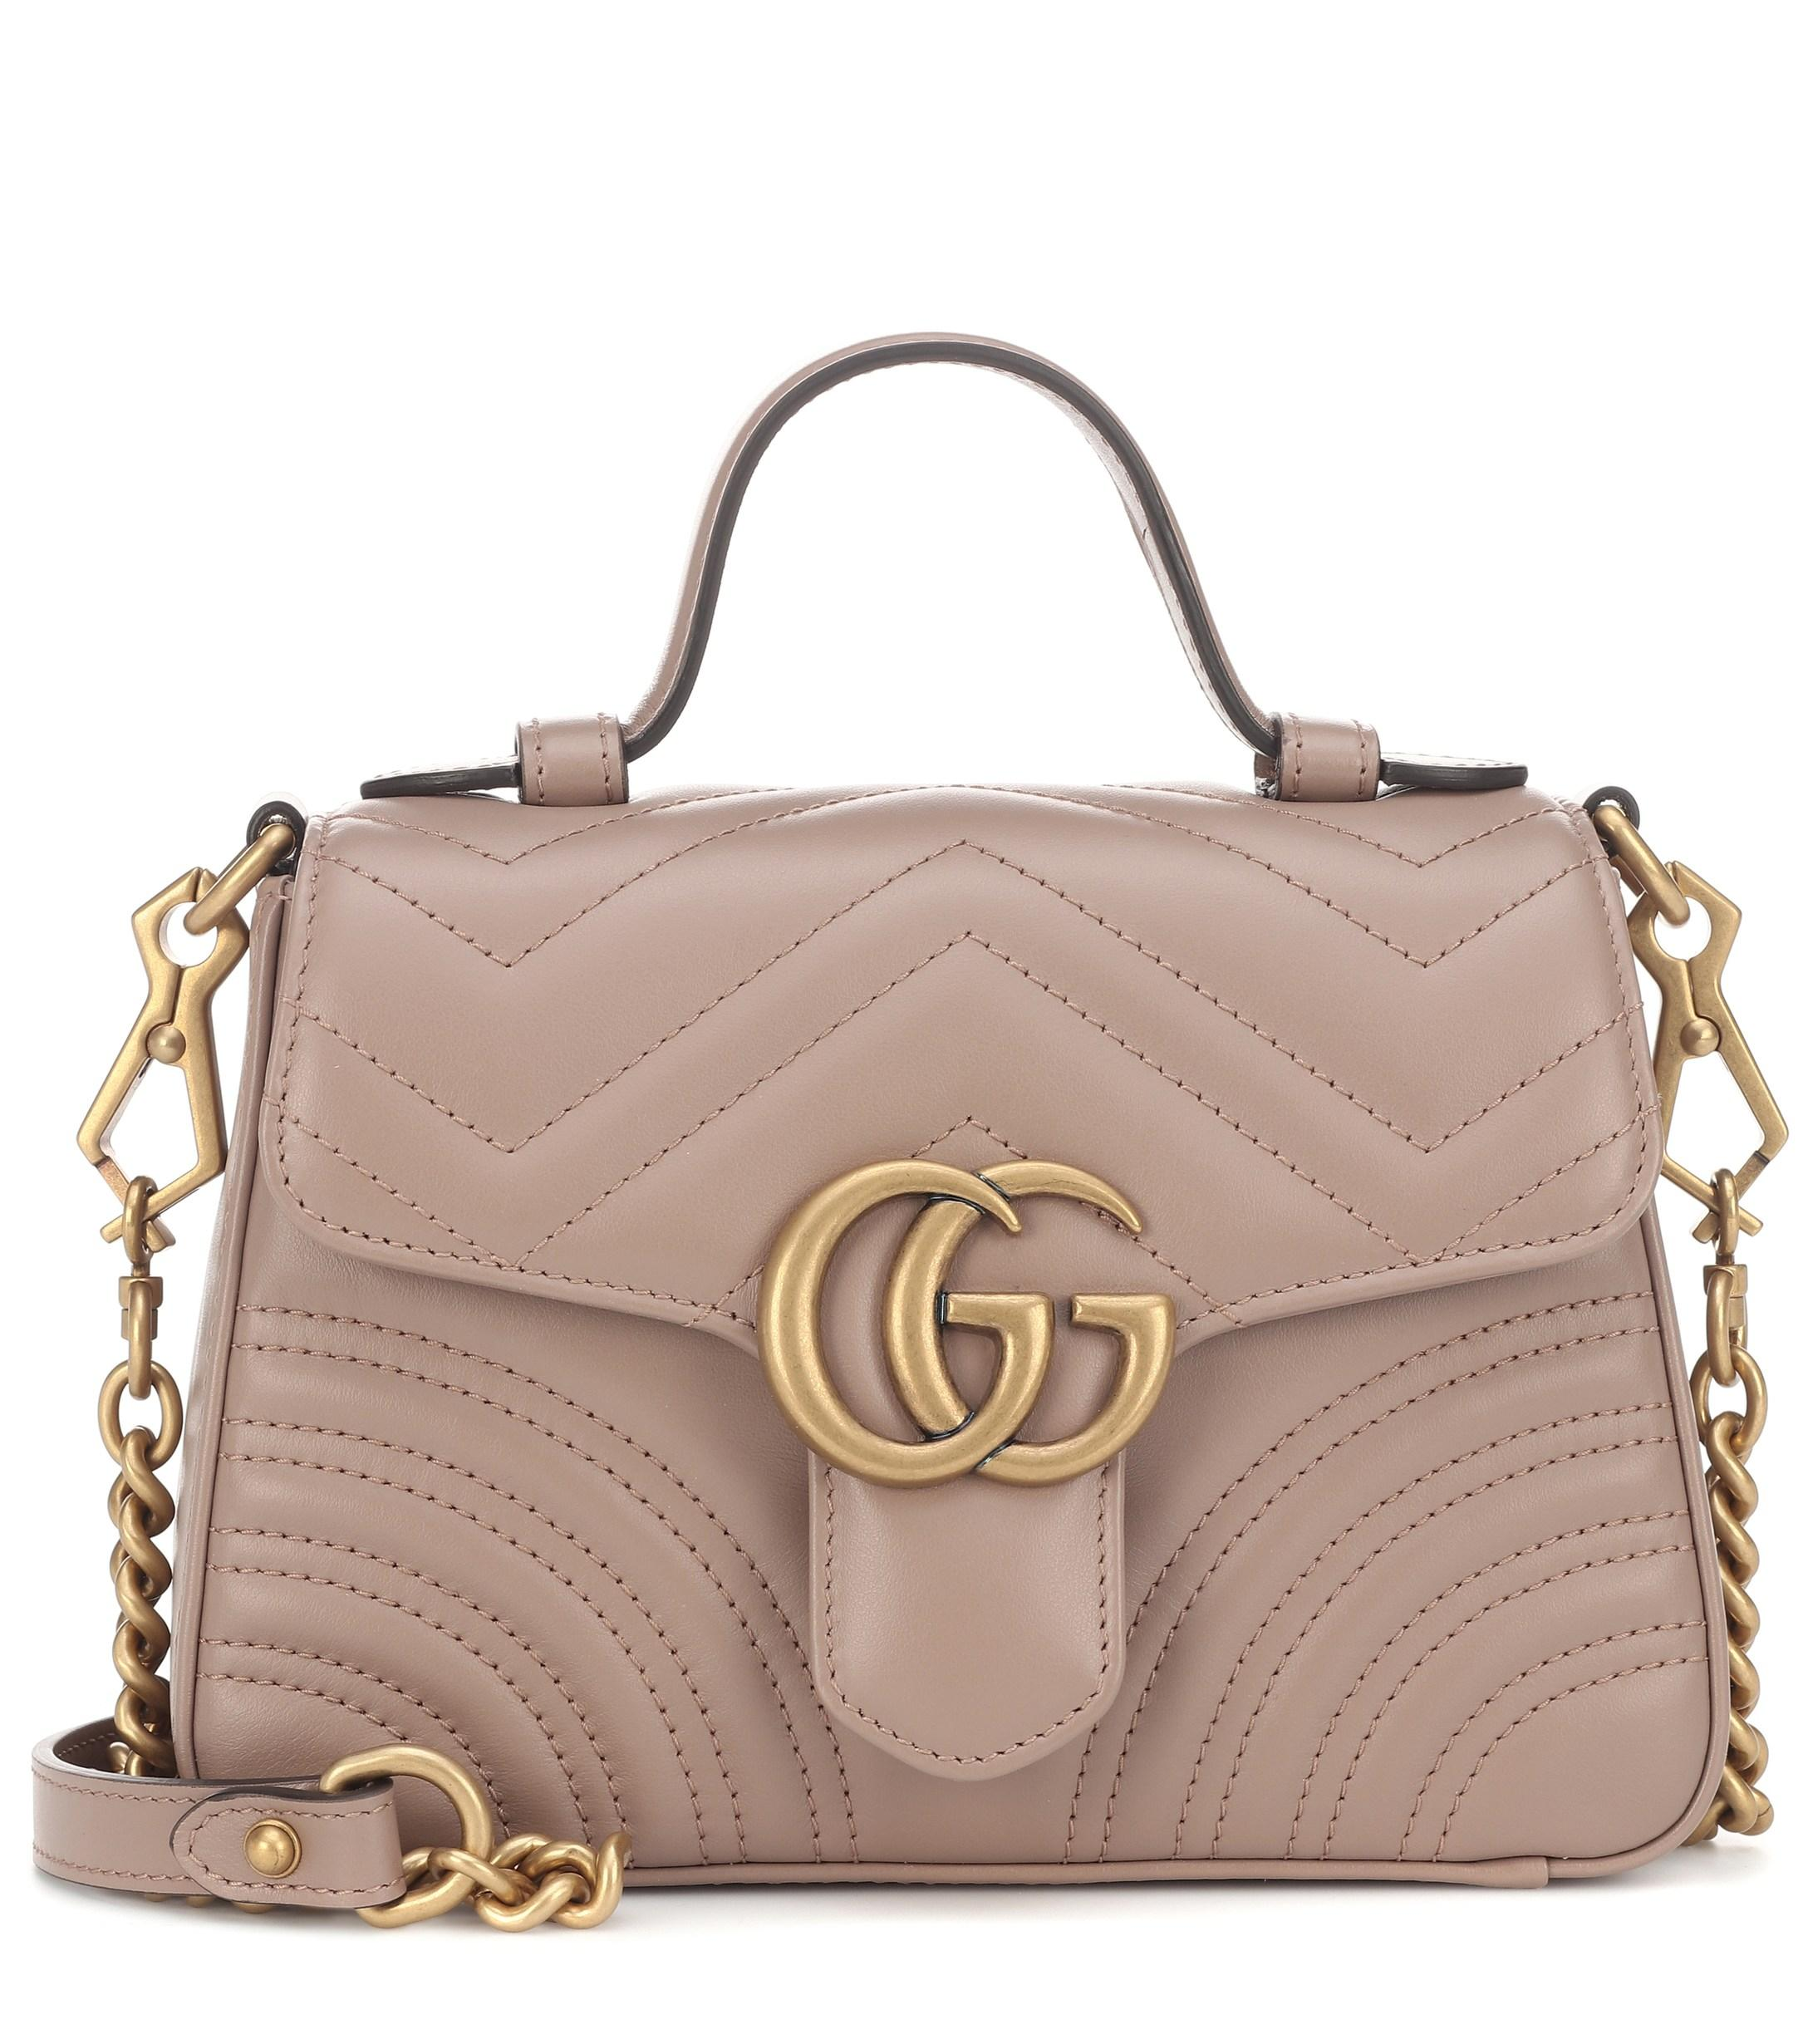 5763d7df95 Gucci GG Marmont Mini Shoulder Bag in Natural - Lyst